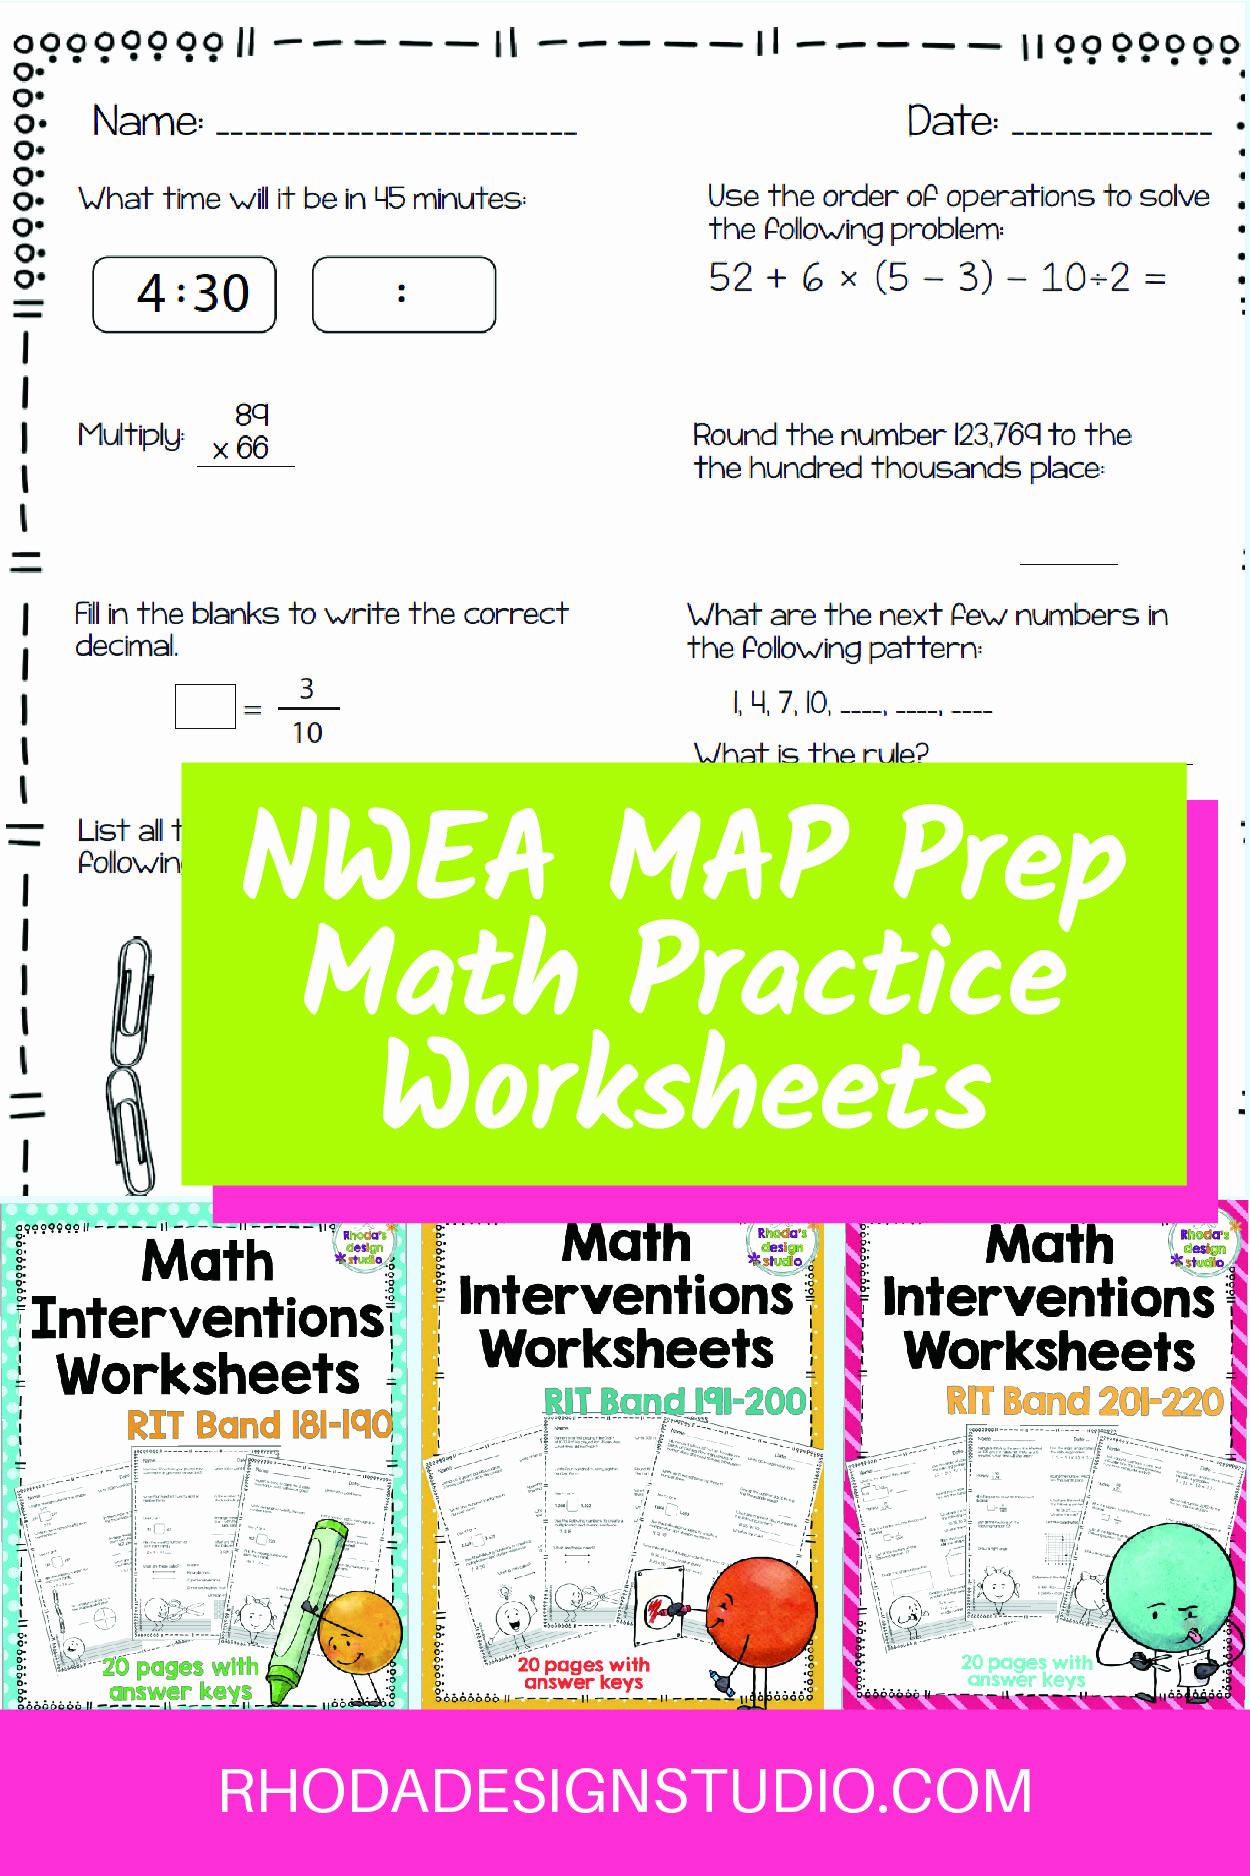 Nwea Math Practice Worksheets Lovely 20 Nwea Math Practice Worksheets